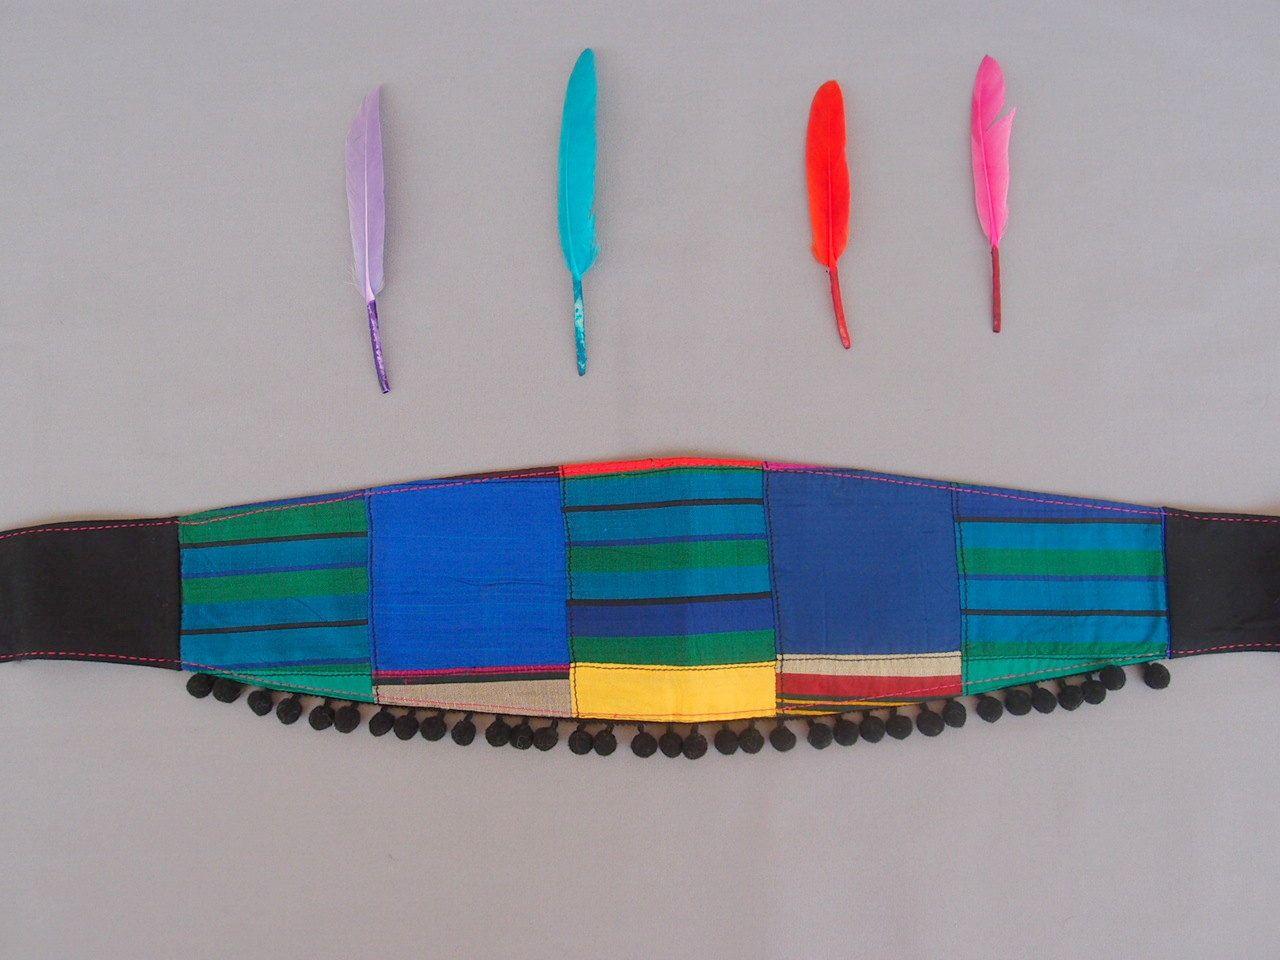 Blue Fabric Women Belt Silk Ribbon Belt Pom Pom Obi Belt Silk Patchwork Belt by baboshkaa on Etsy https://www.etsy.com/listing/190837664/blue-fabric-women-belt-silk-ribbon-belt